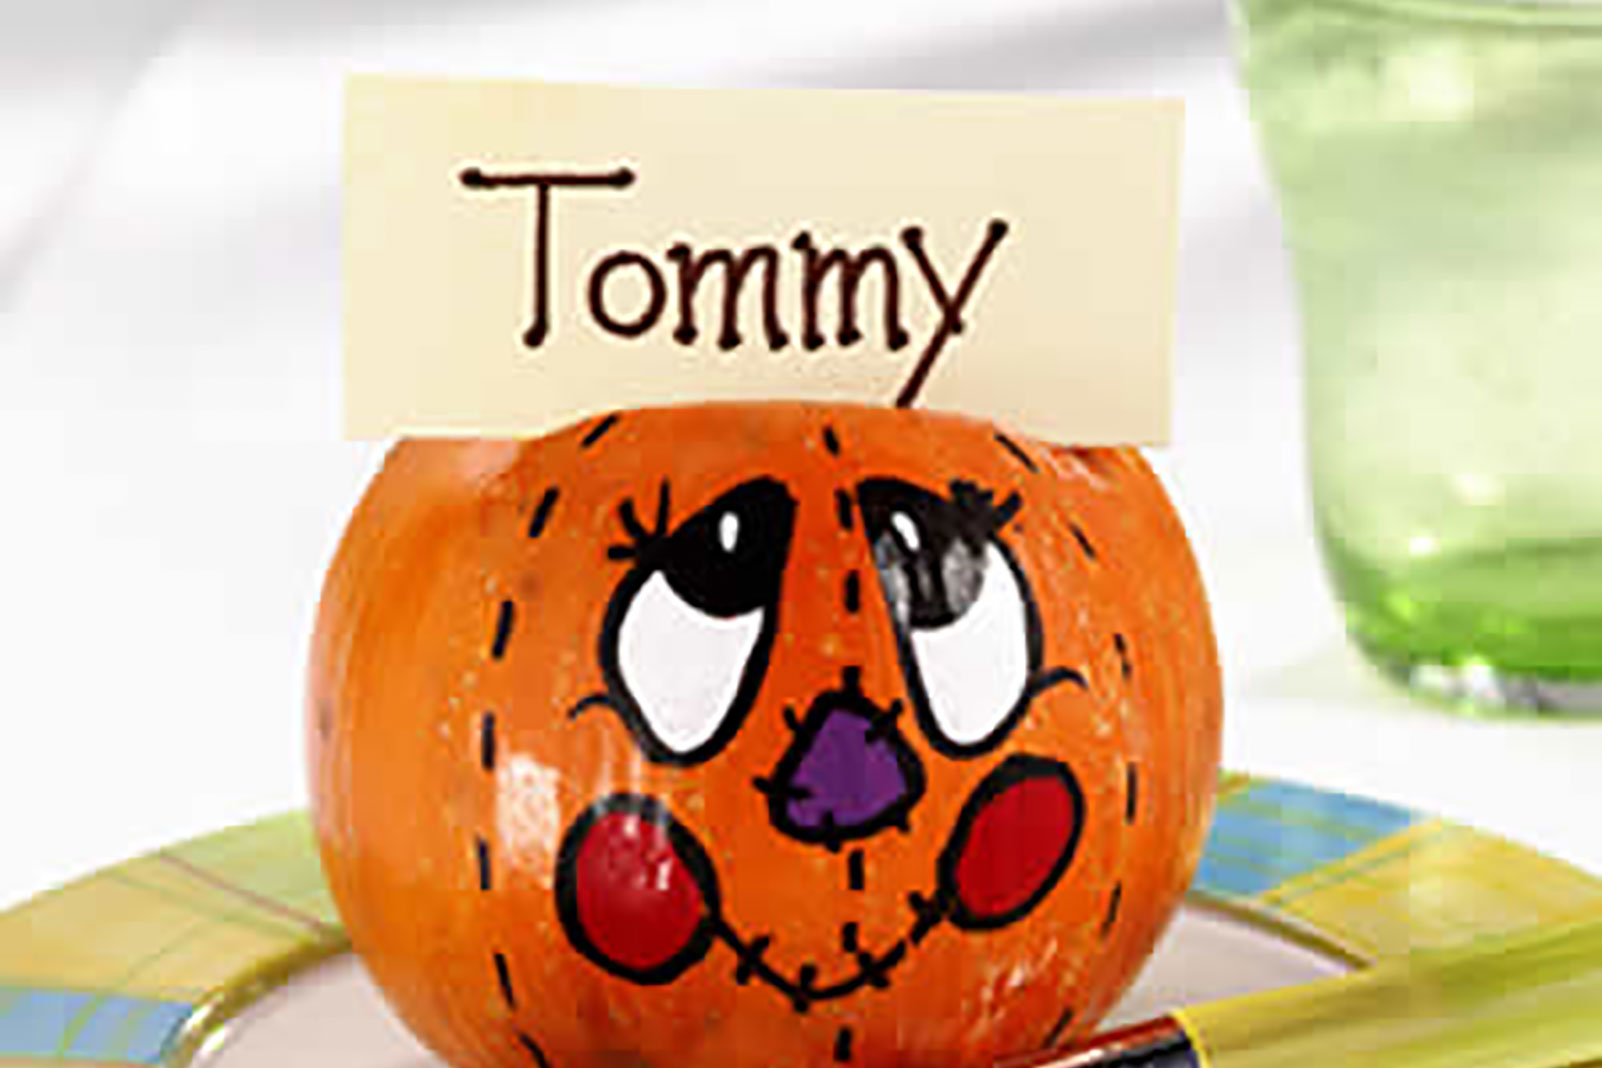 Smiling Pumpkin Place Cards